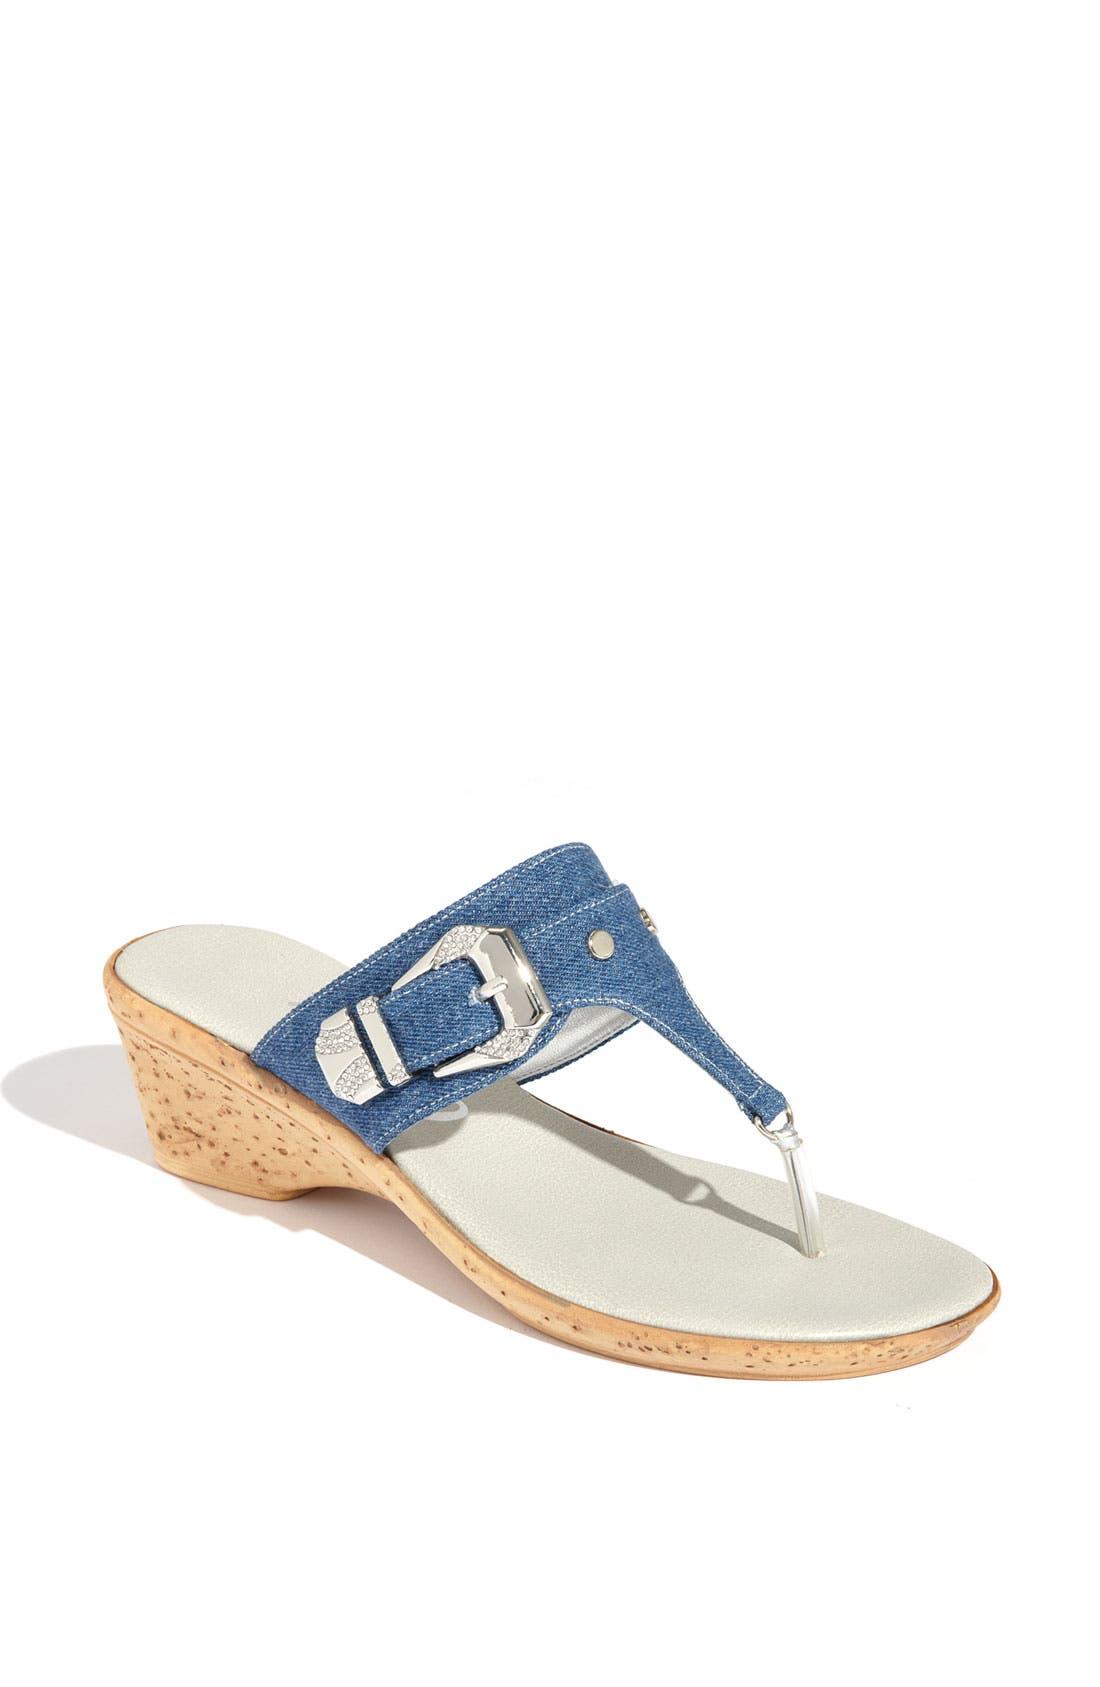 Alternate Image 1 Selected - Onex 'Texas' Sandal